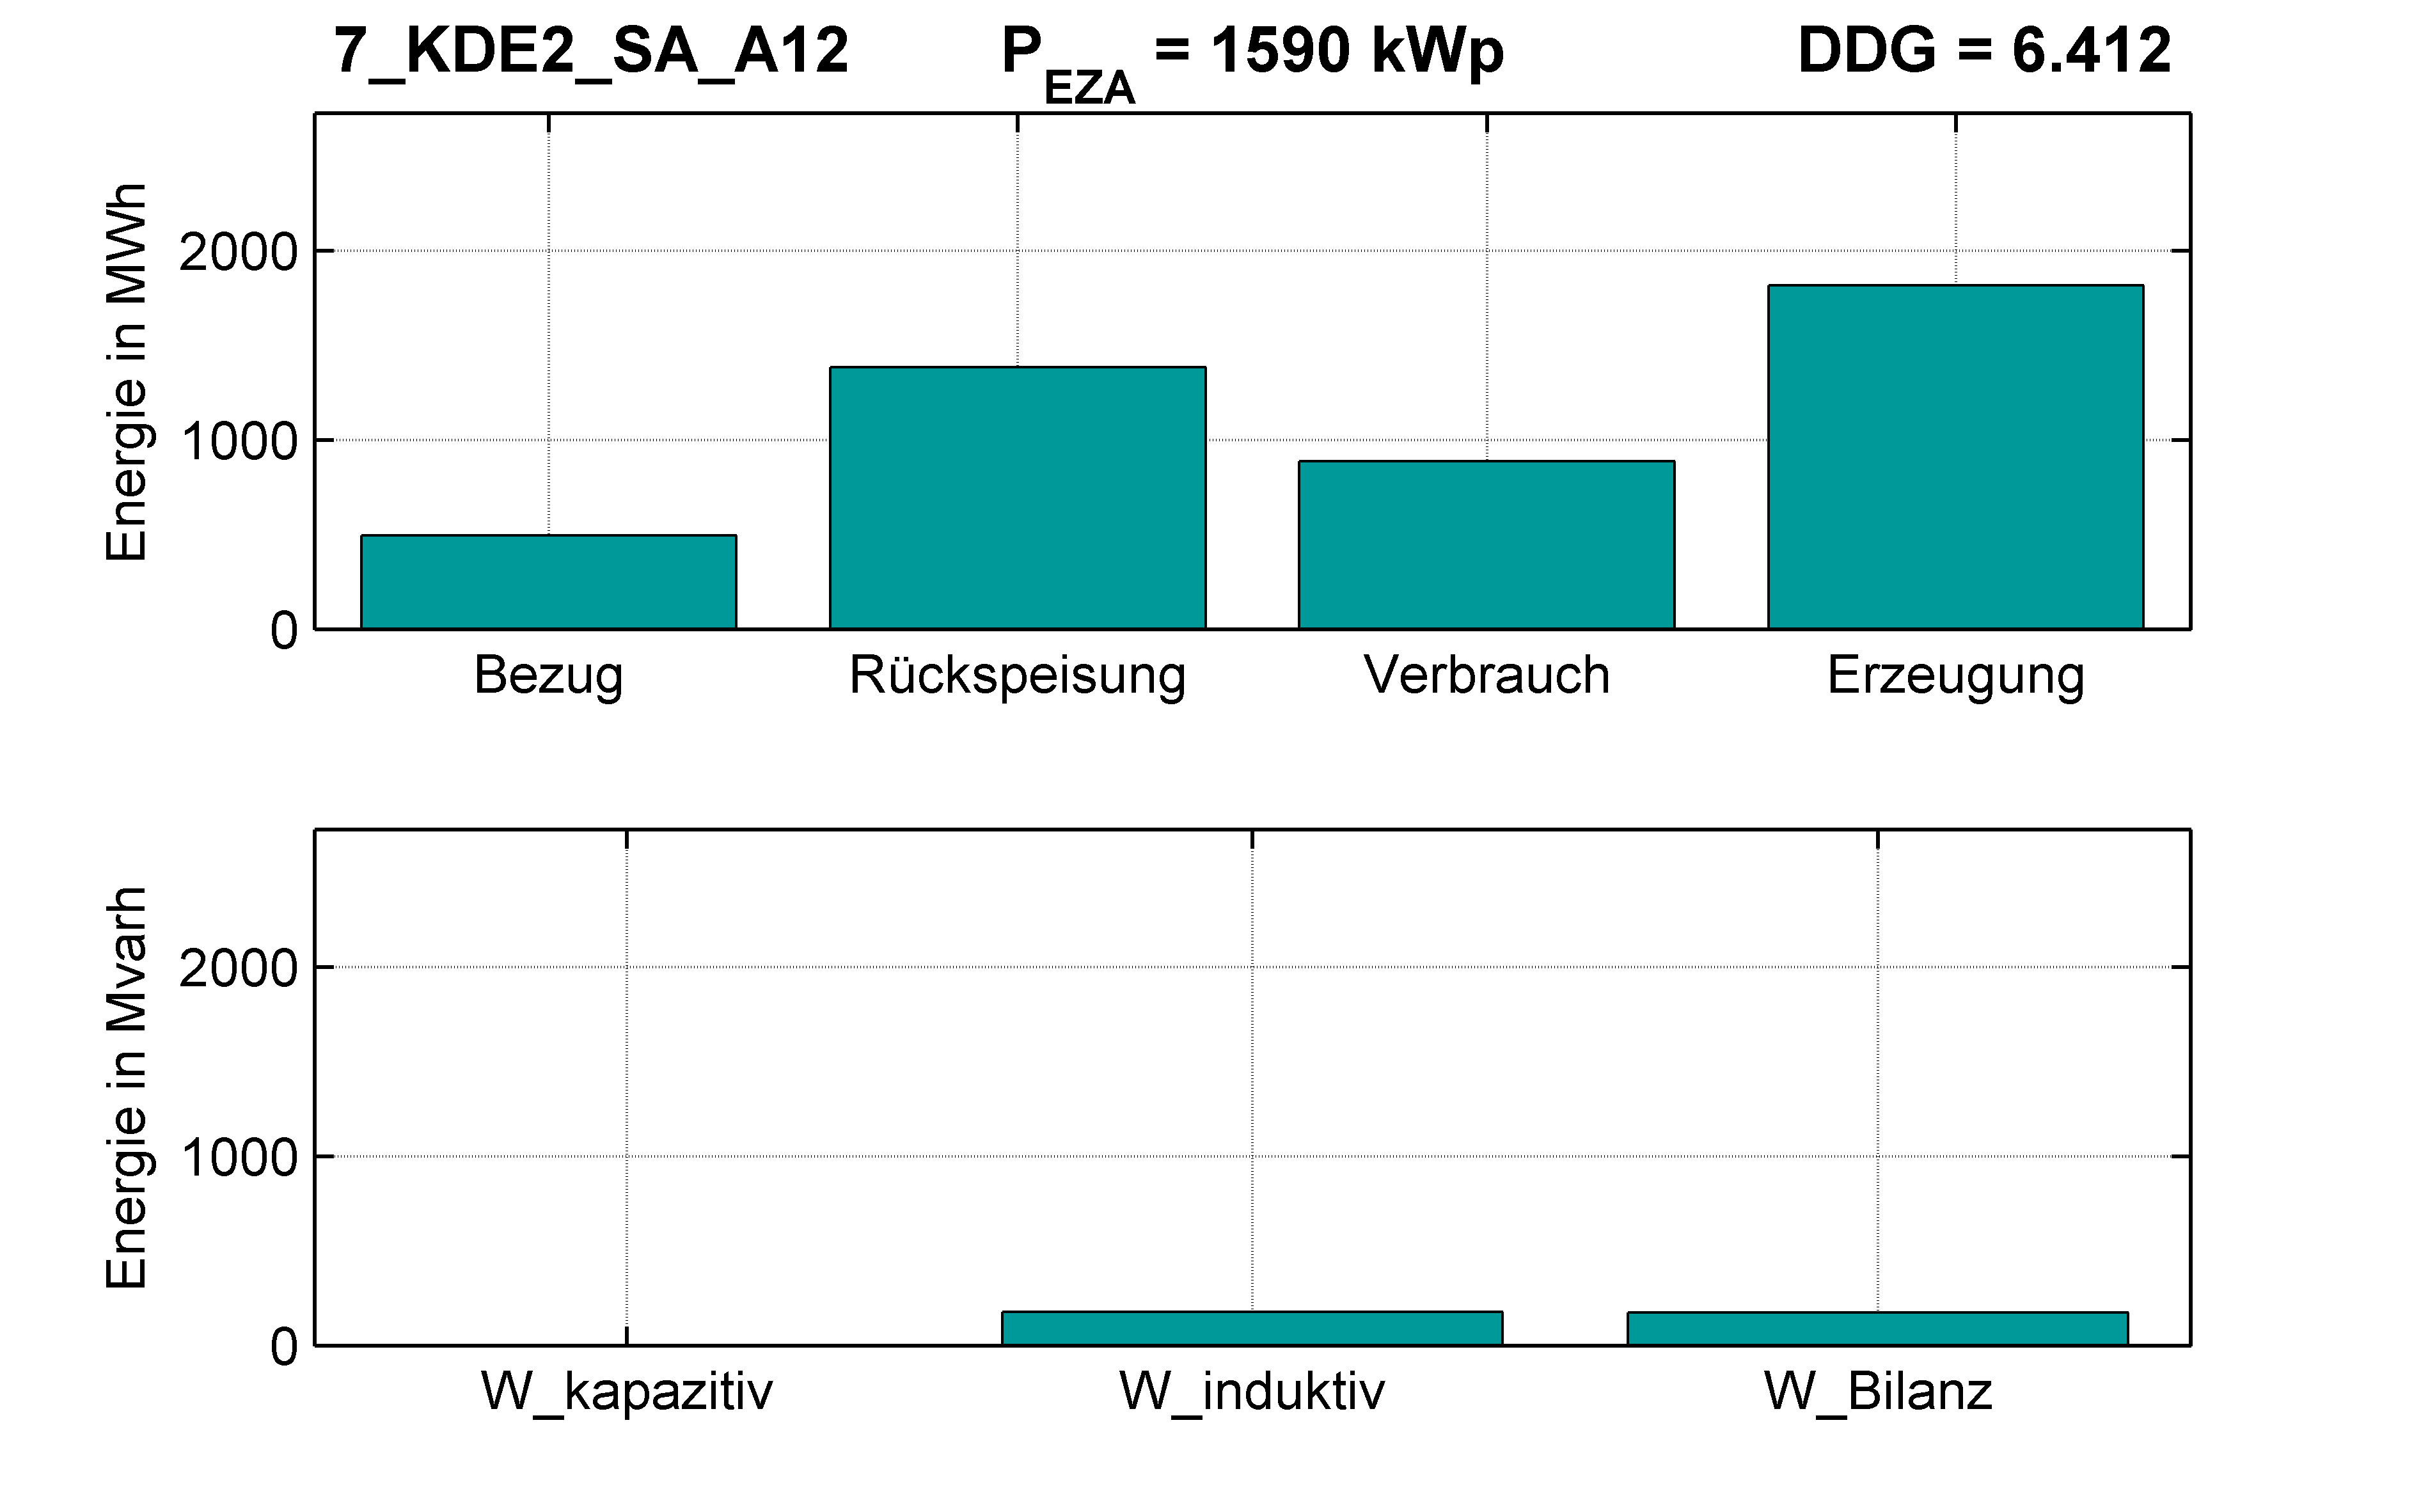 KDE2 | Längsregler (SA) A12 | PQ-Bilanz